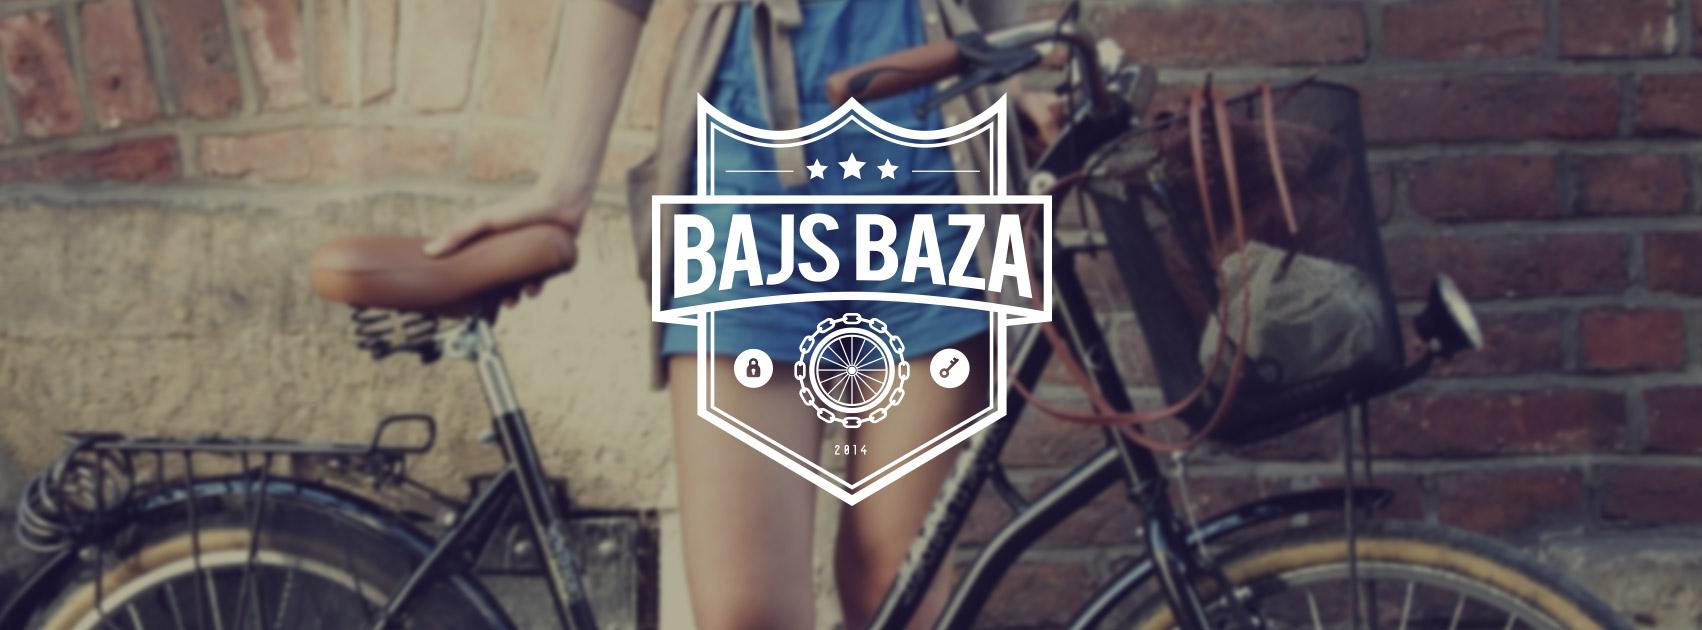 Bajs Baza čuva vaše bicikle